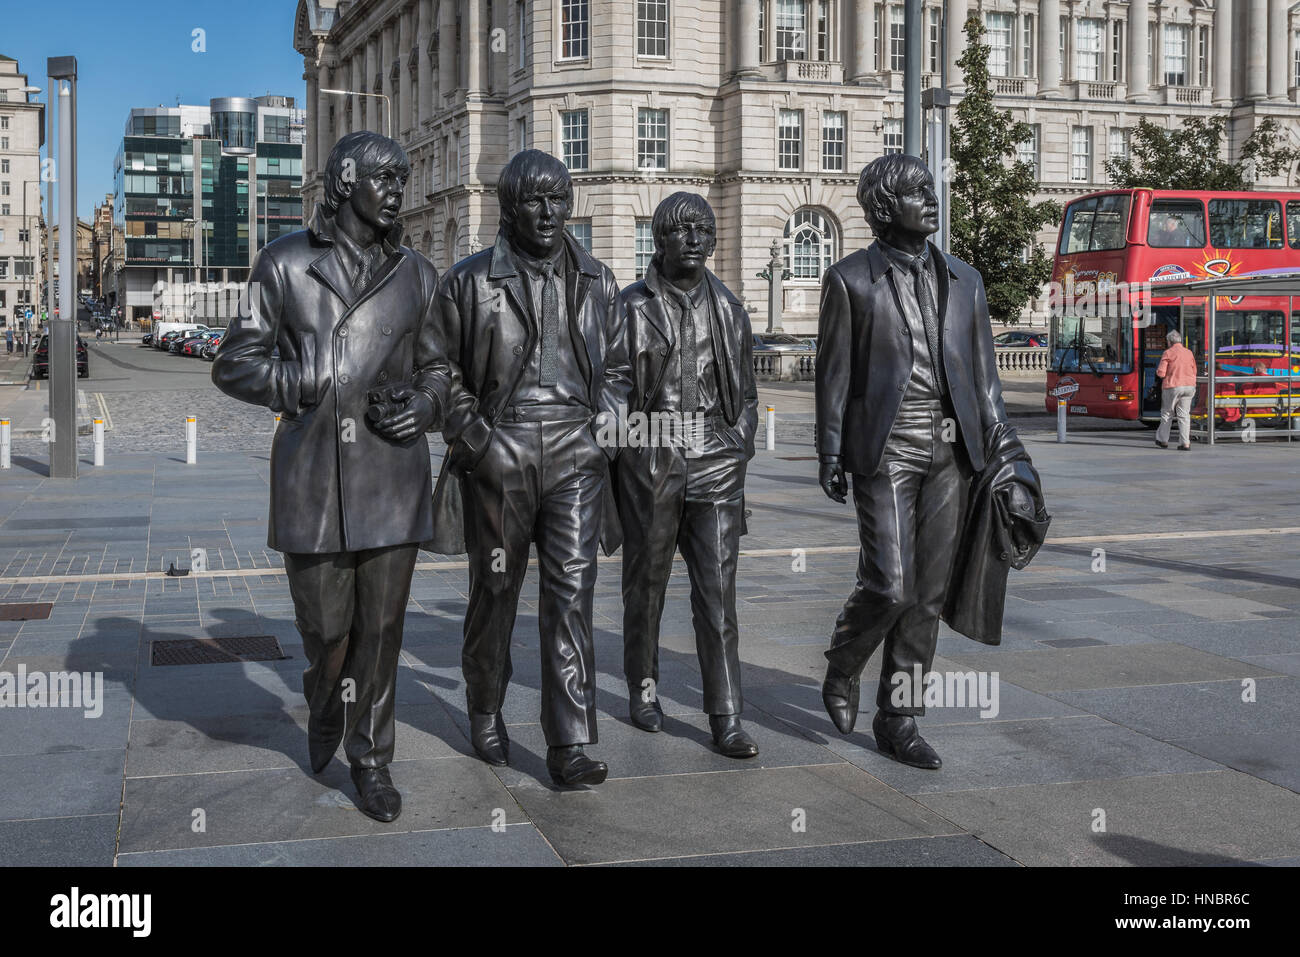 The Beatles statue, Pier Head, Liverpool, UK - Stock Image